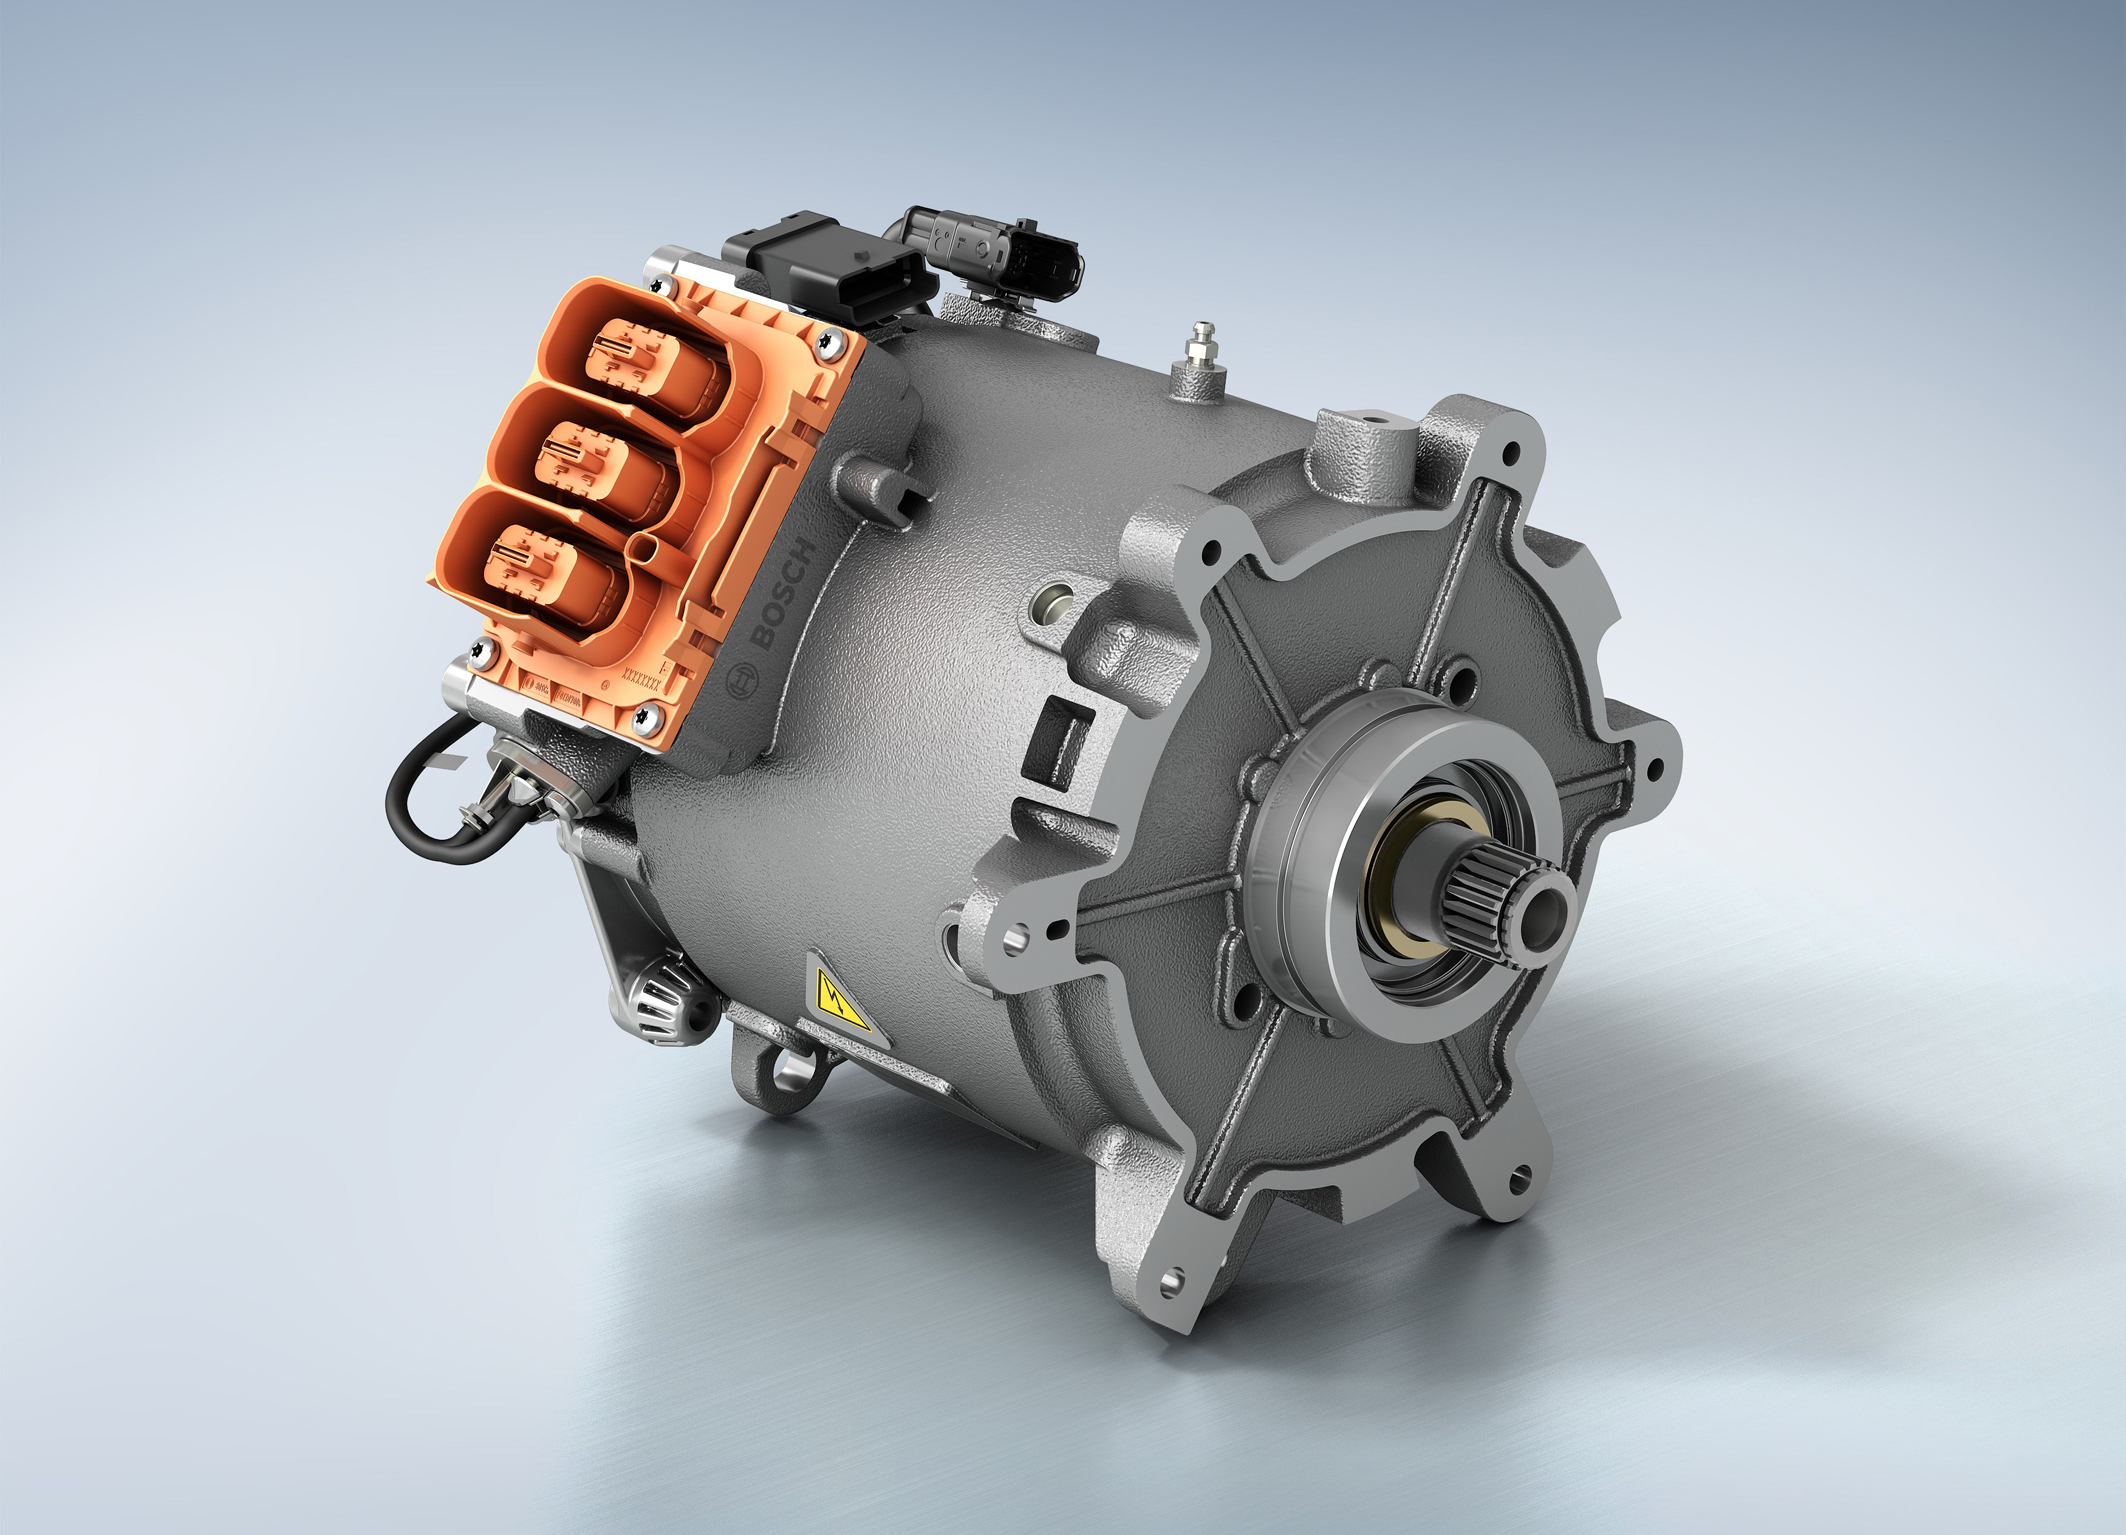 Bosch Axle Split Hybrid Drive Honoured With Automechanika Innovation Award Bosch Media Service